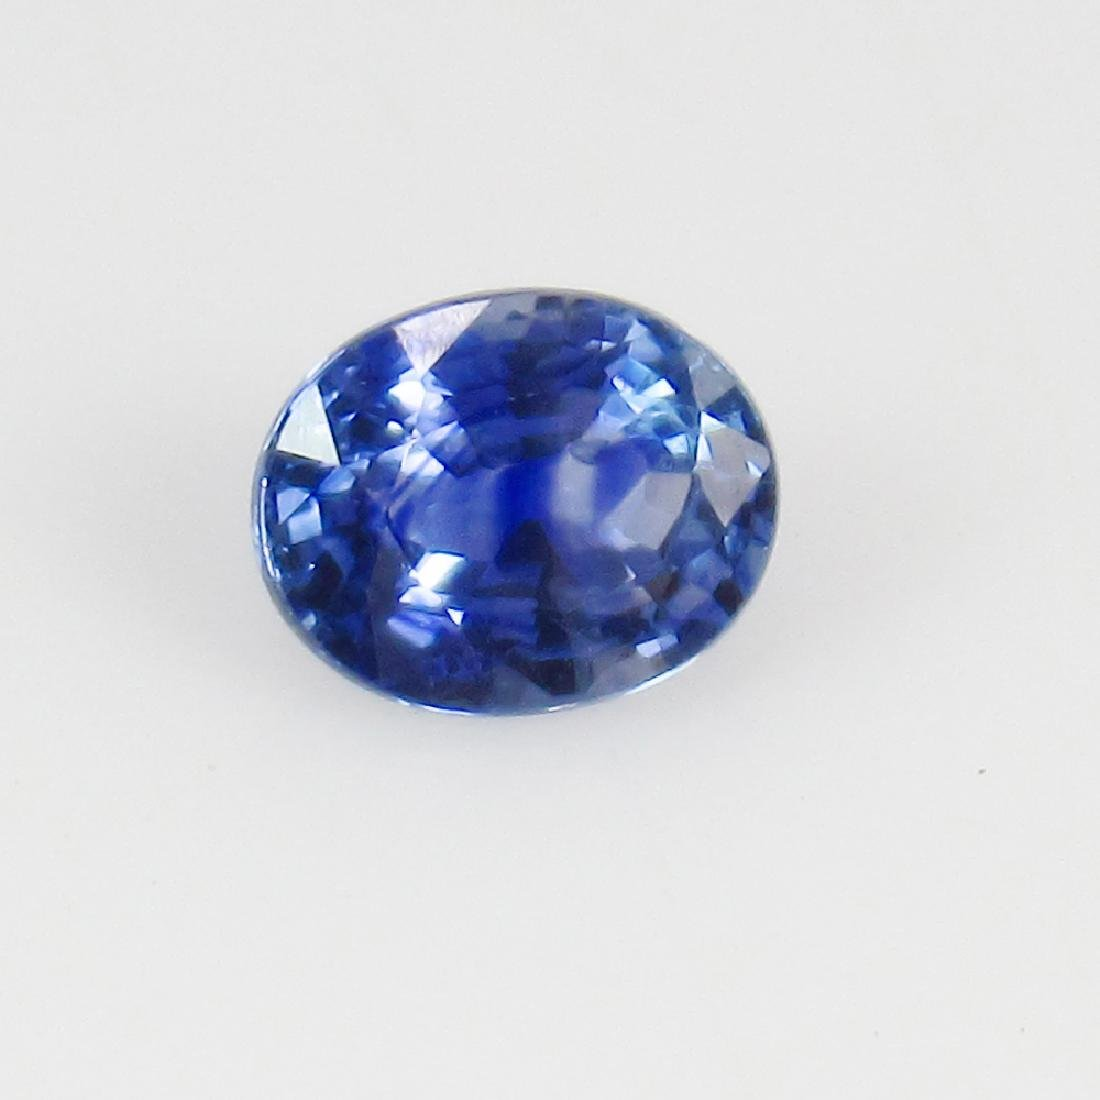 0.80 Ct Genuine Ceylon Blue Sapphire Top Class Luster